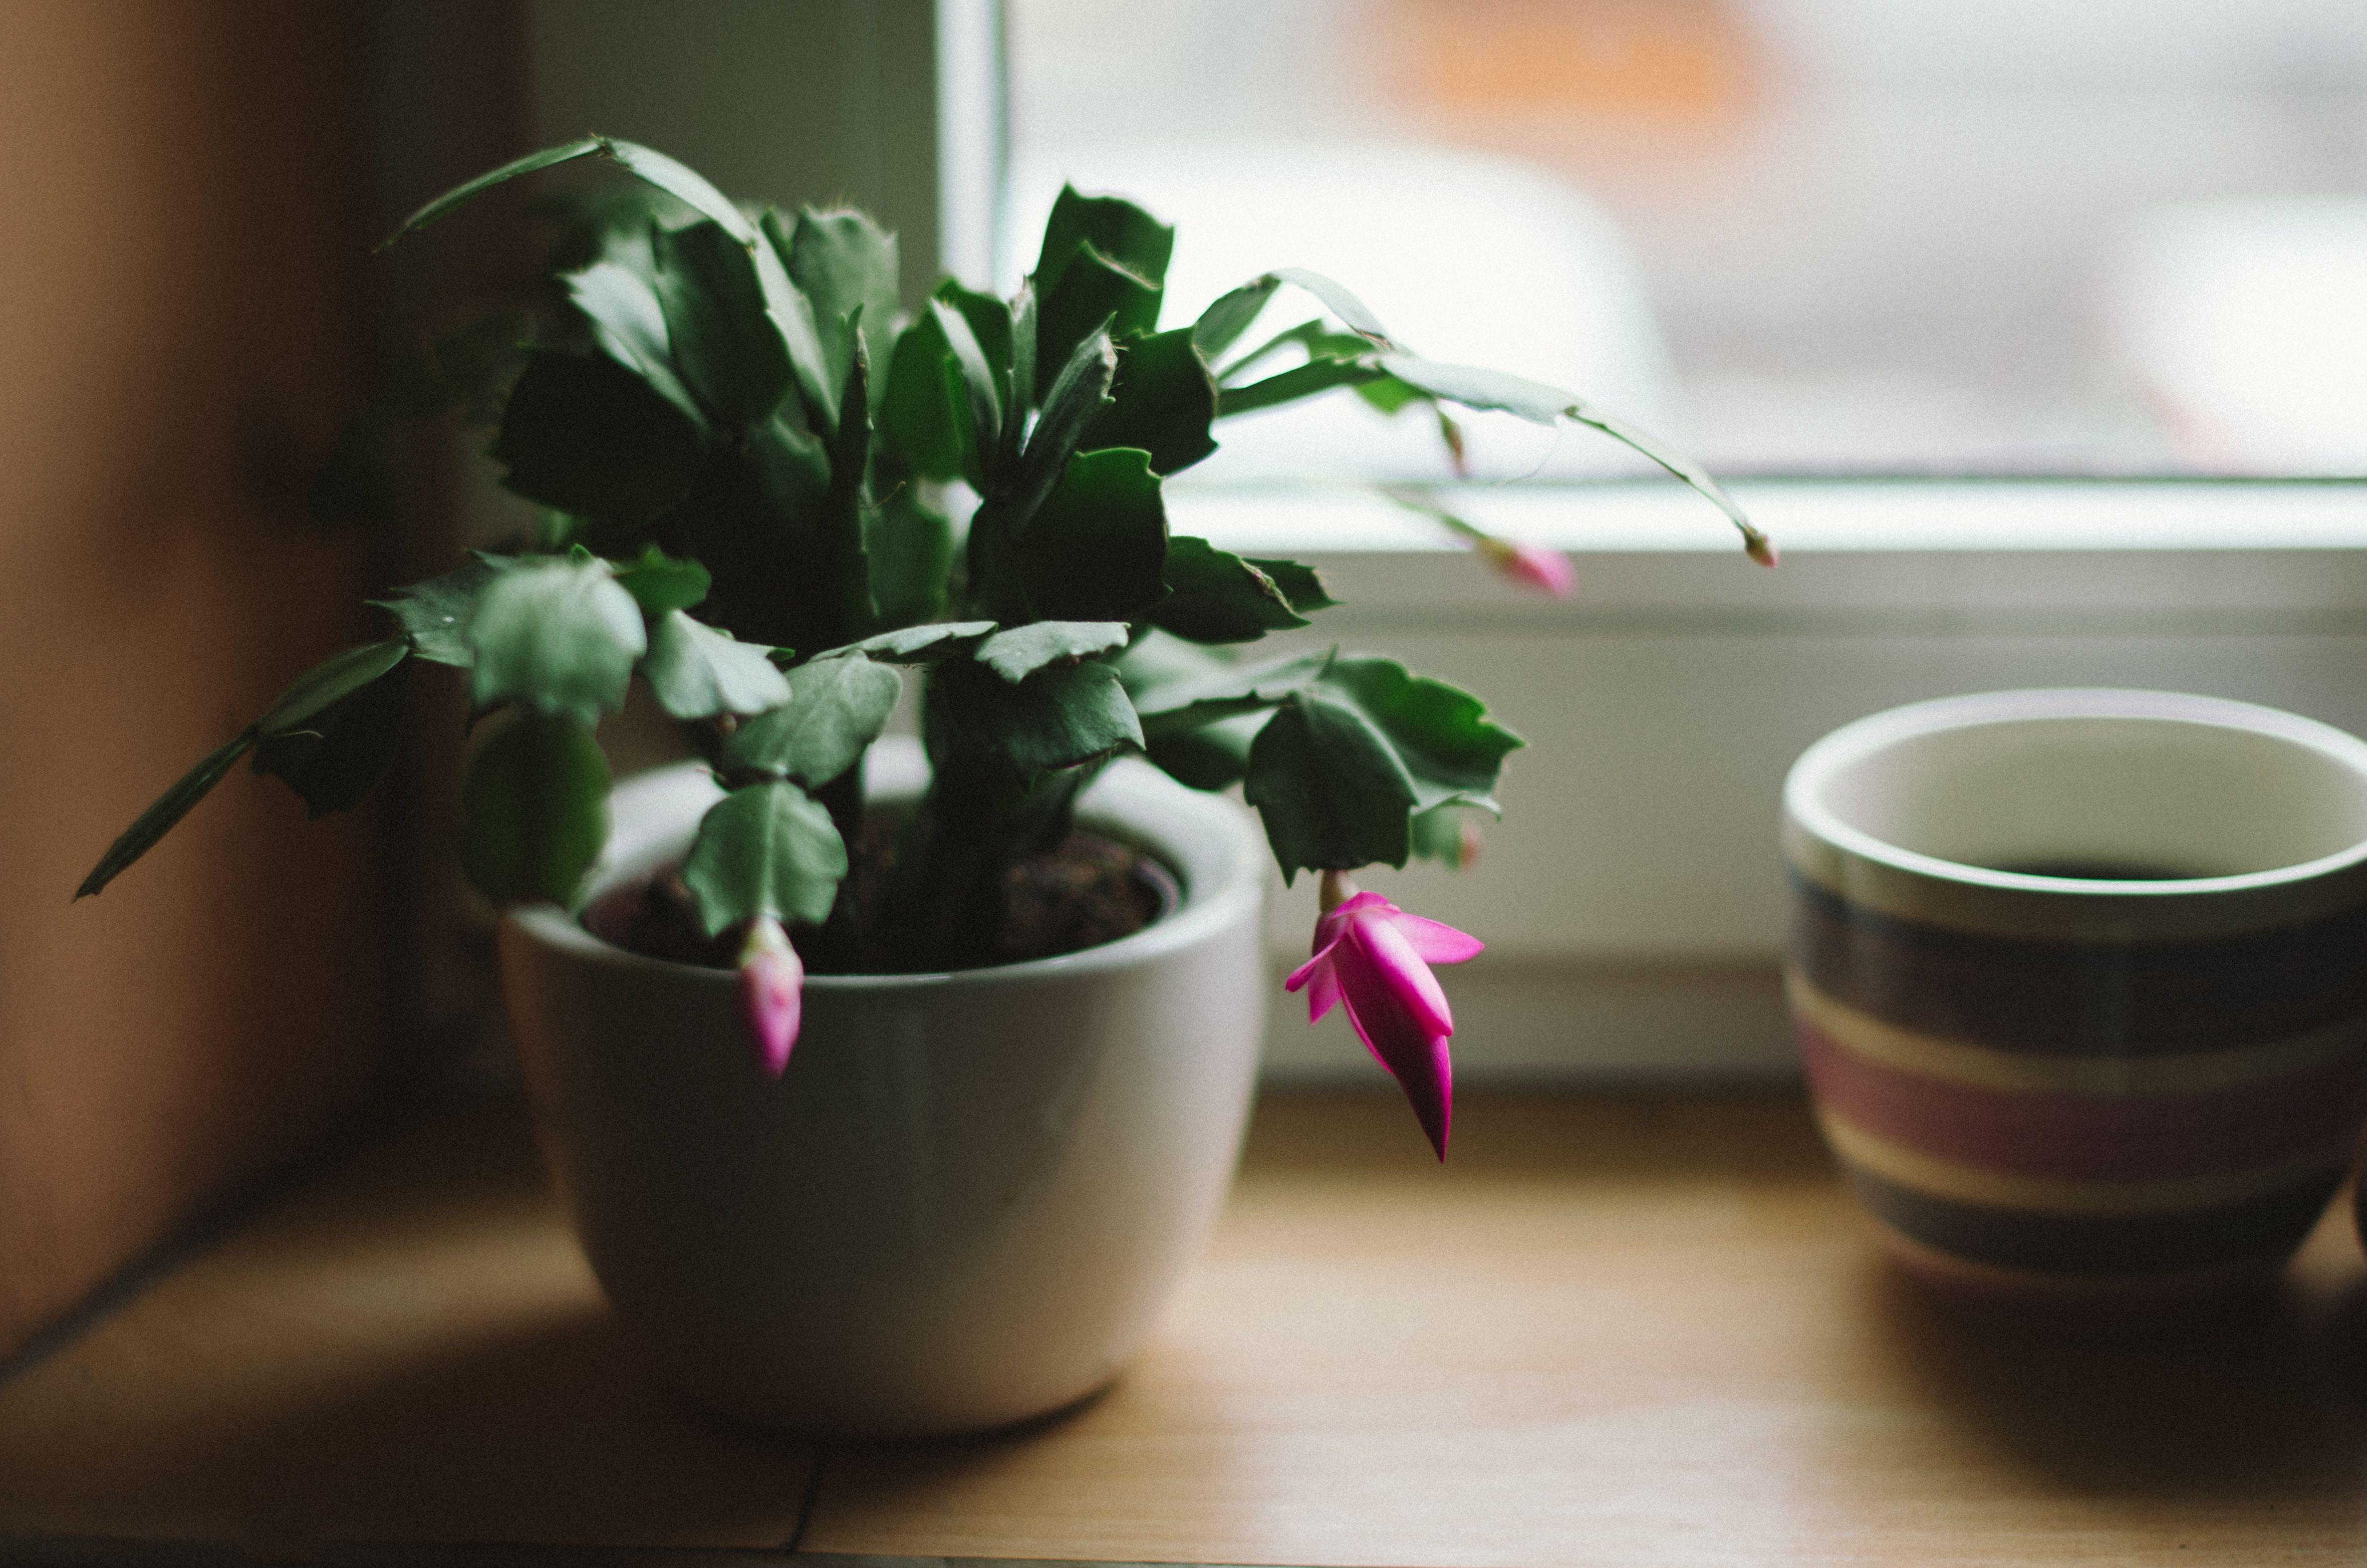 Christmas Cactus (Schlumbergera x buckleyi). Schlumbergera plant in pot